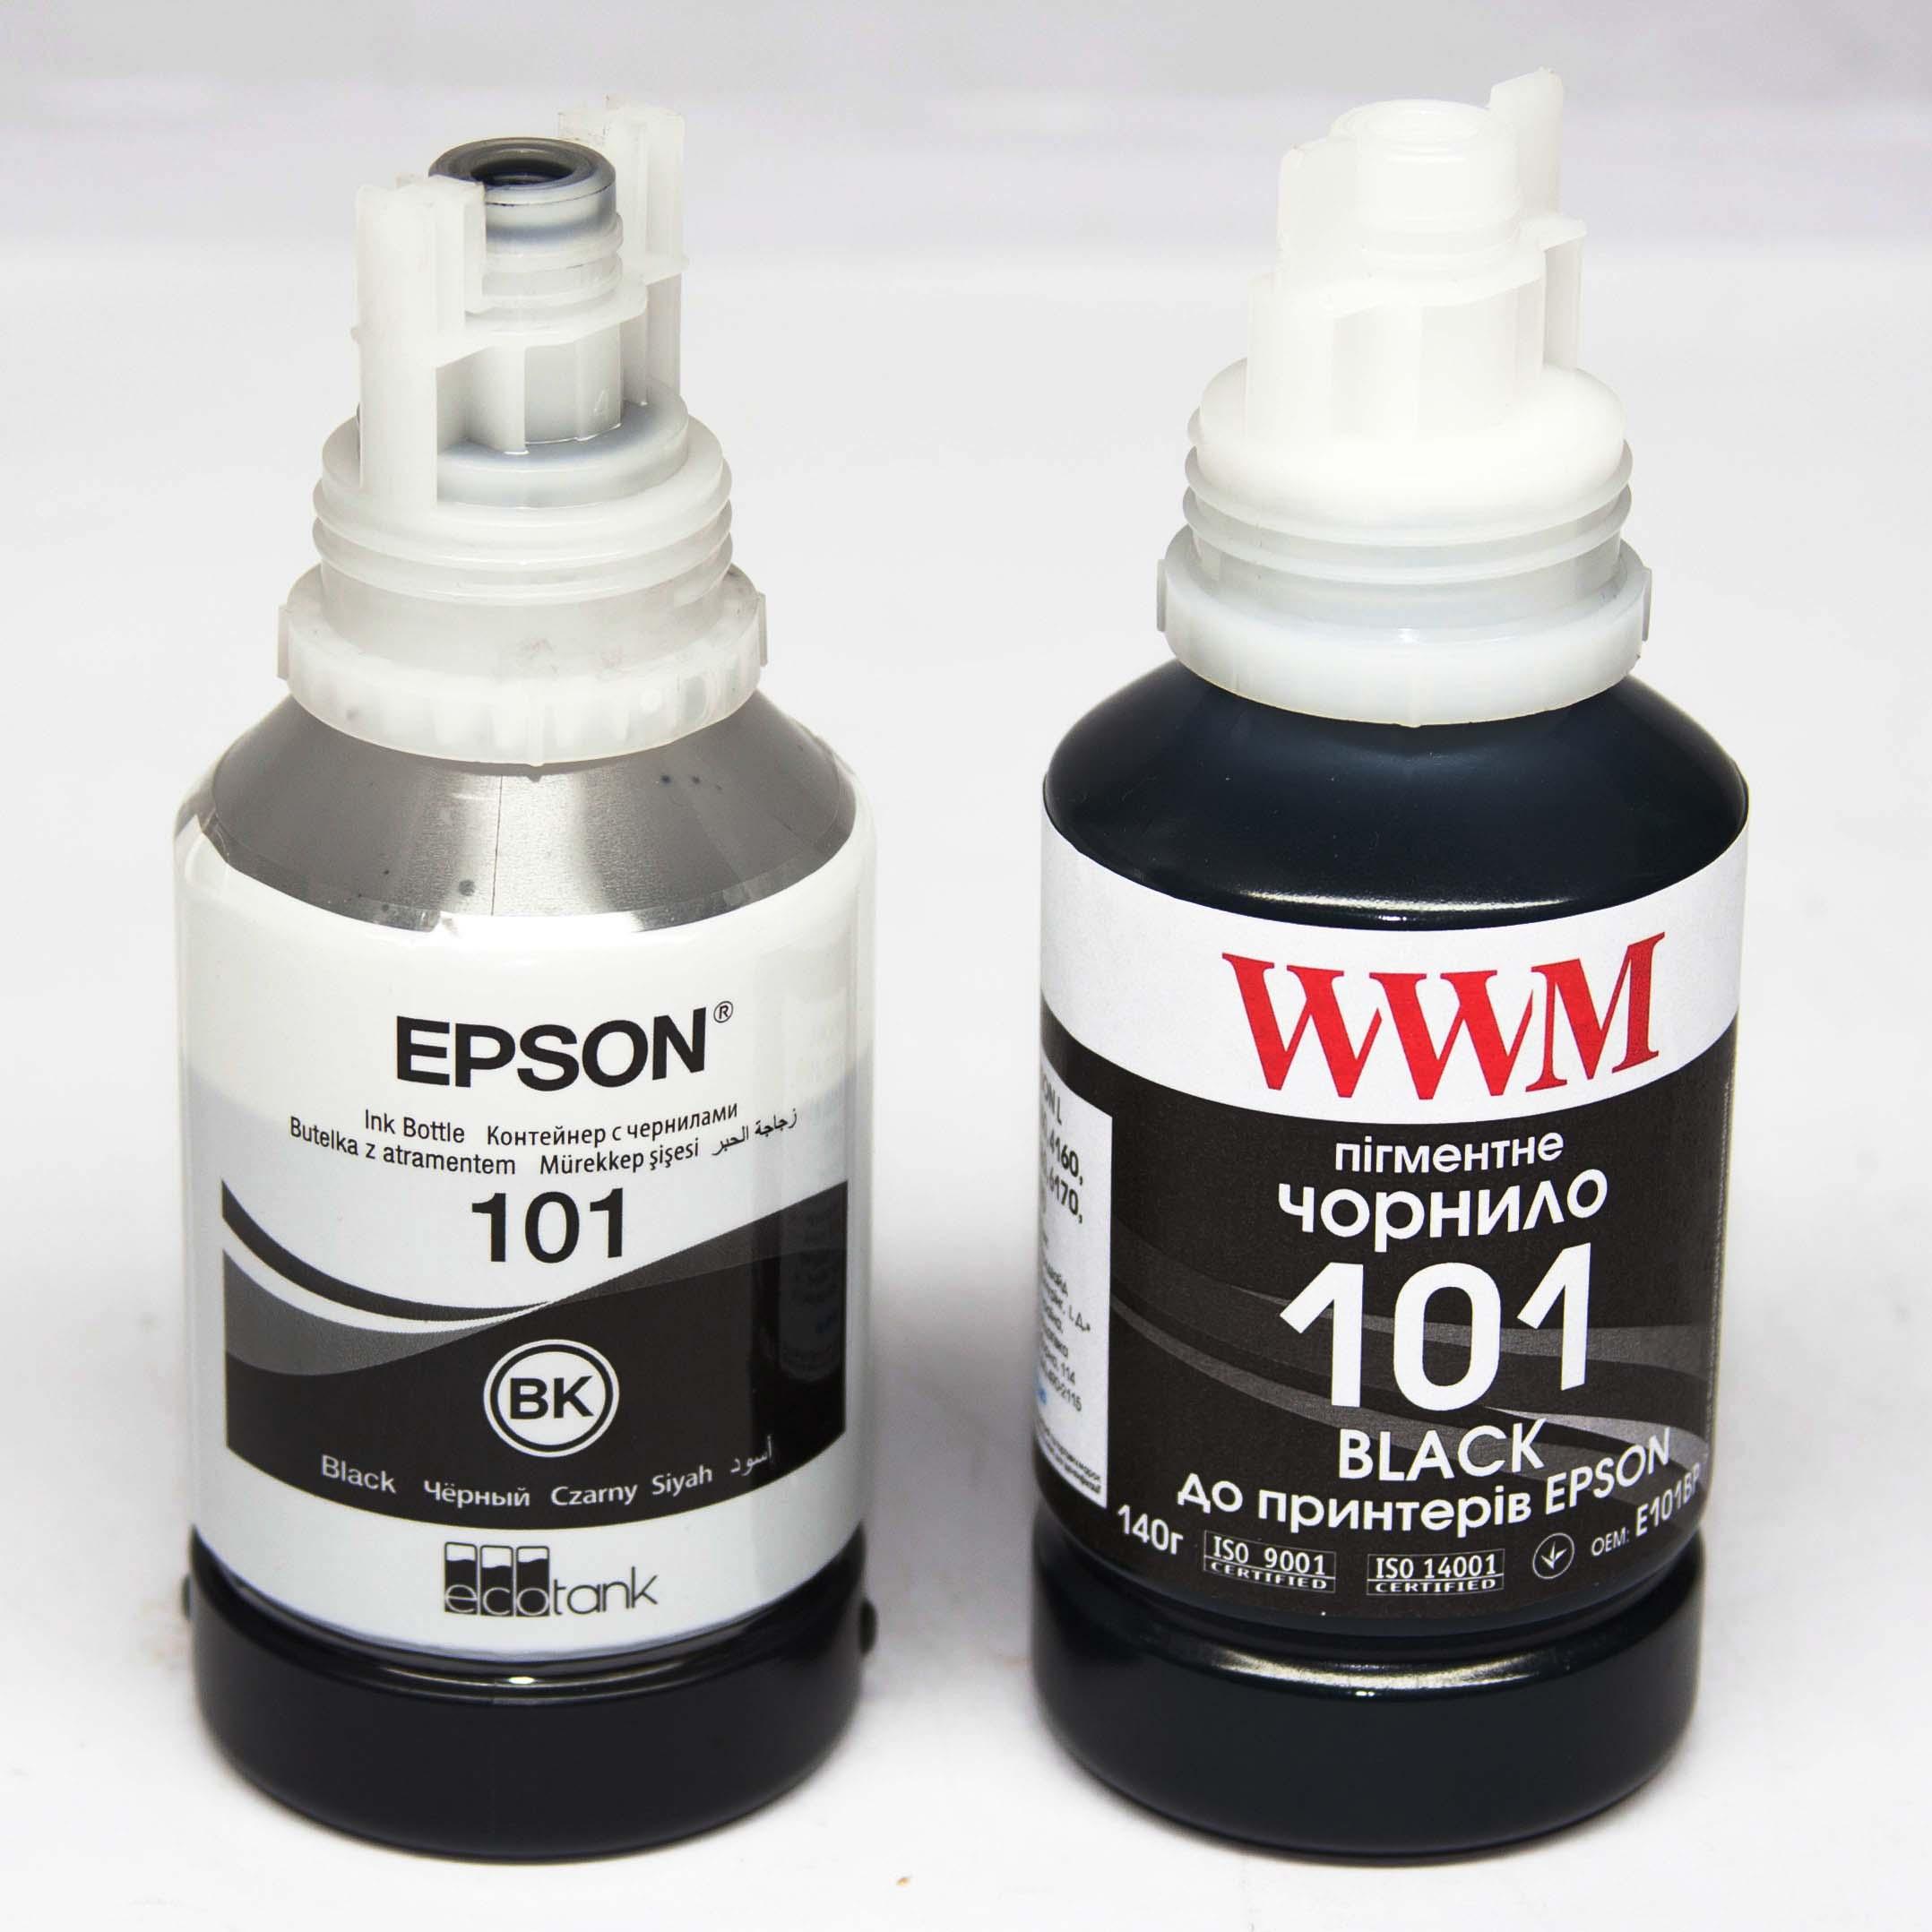 Epson 101 vs WWM 101